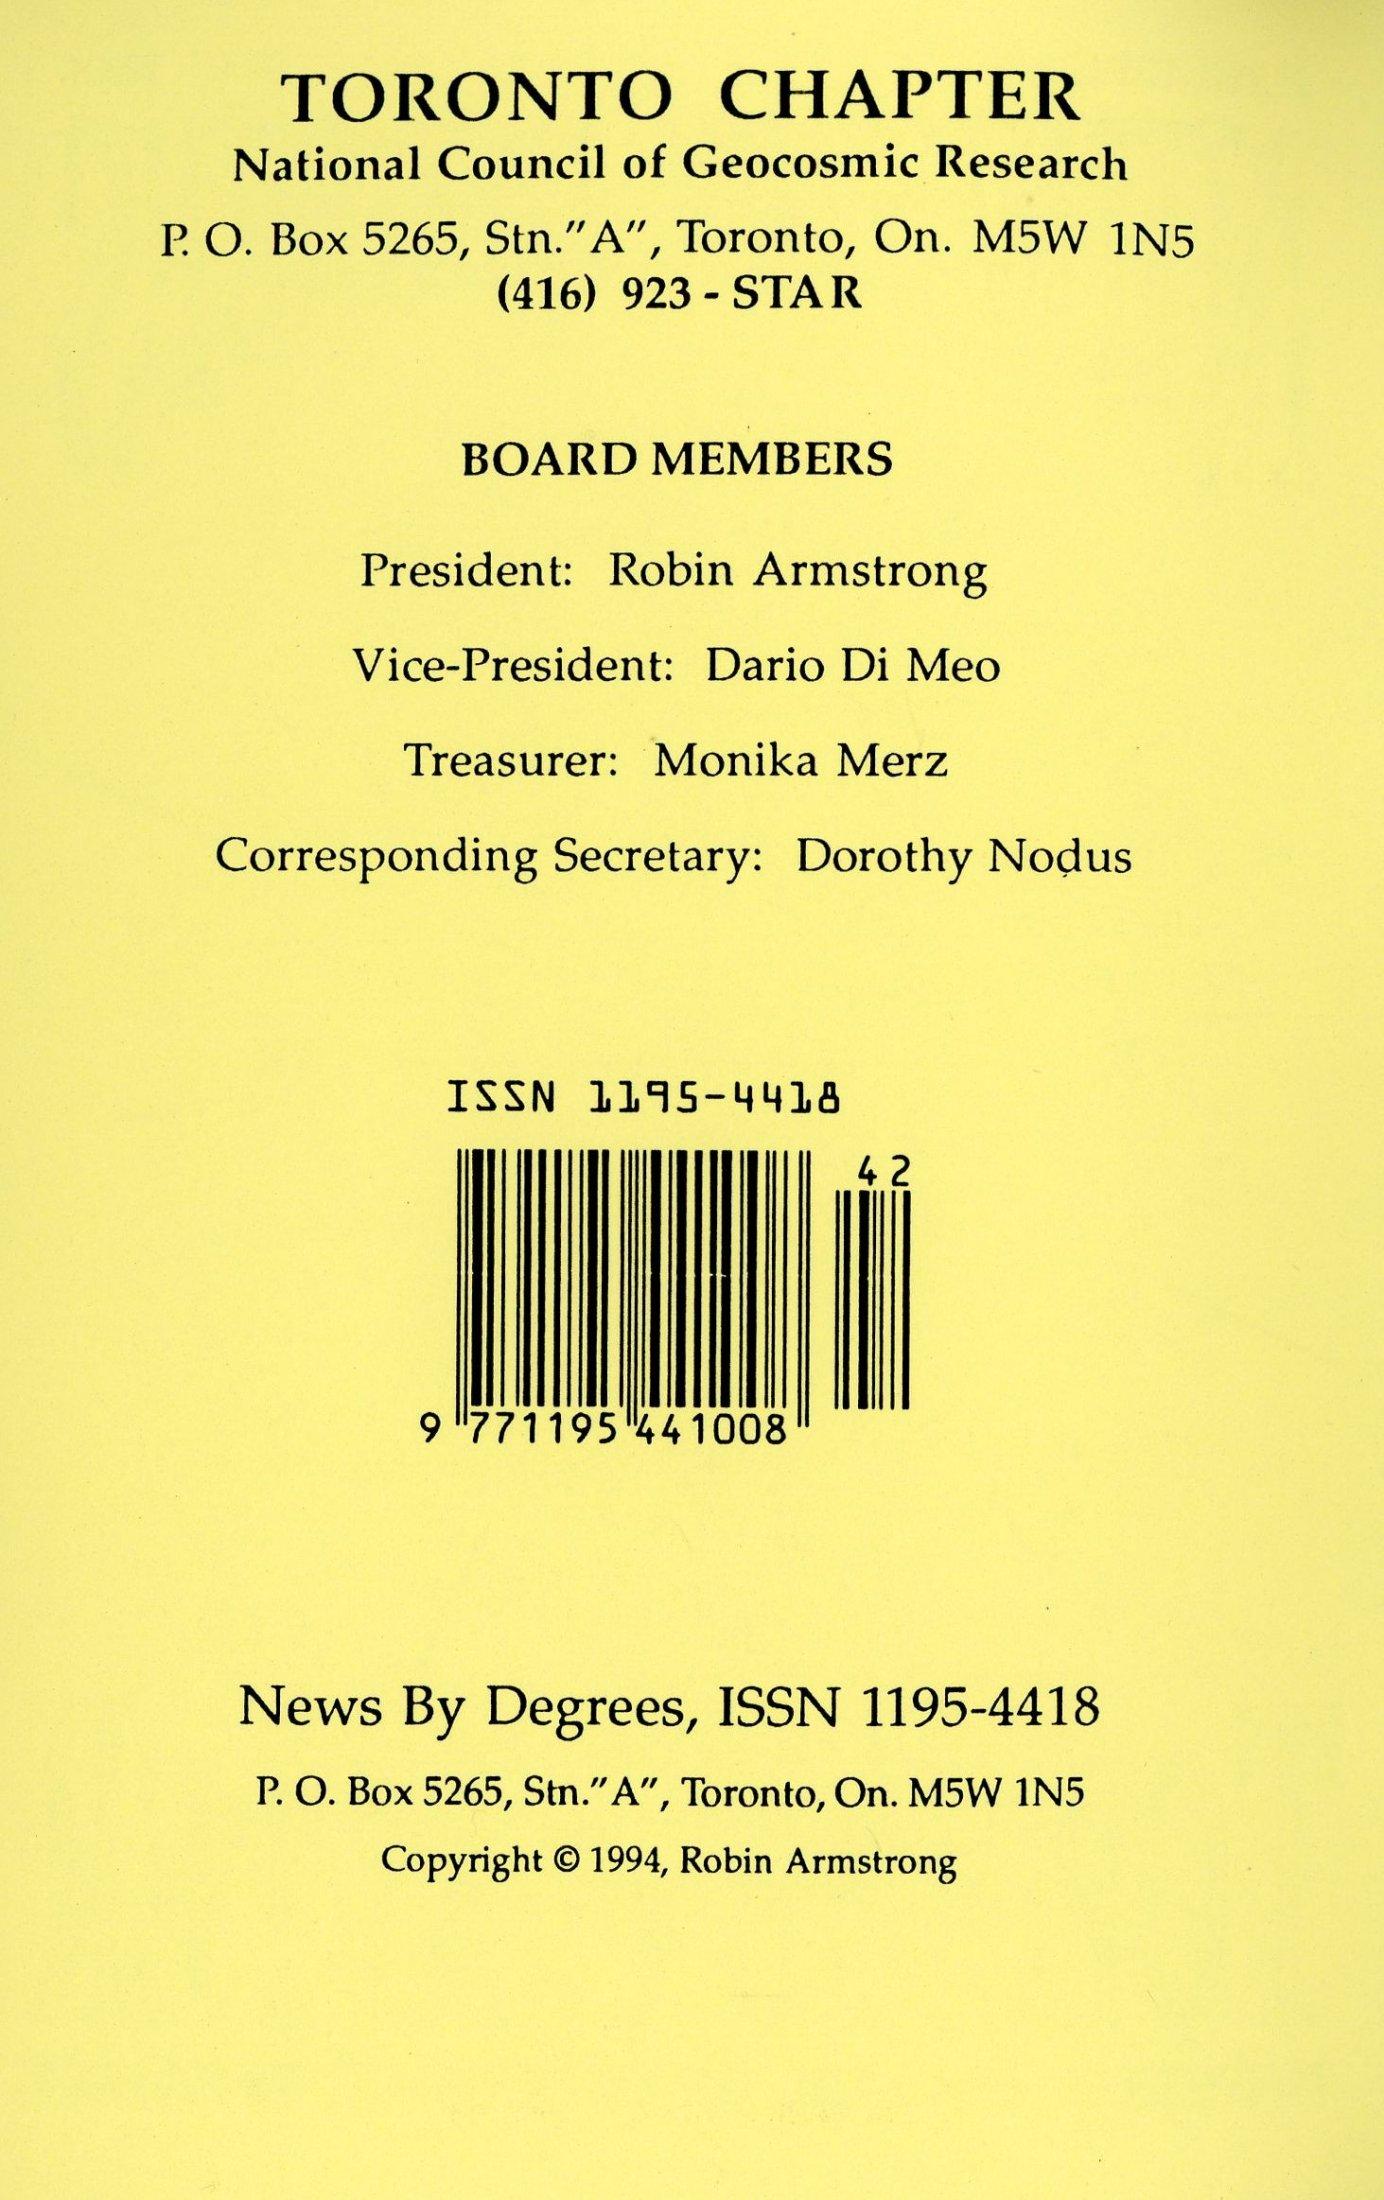 NBDv1-4-001b-cover